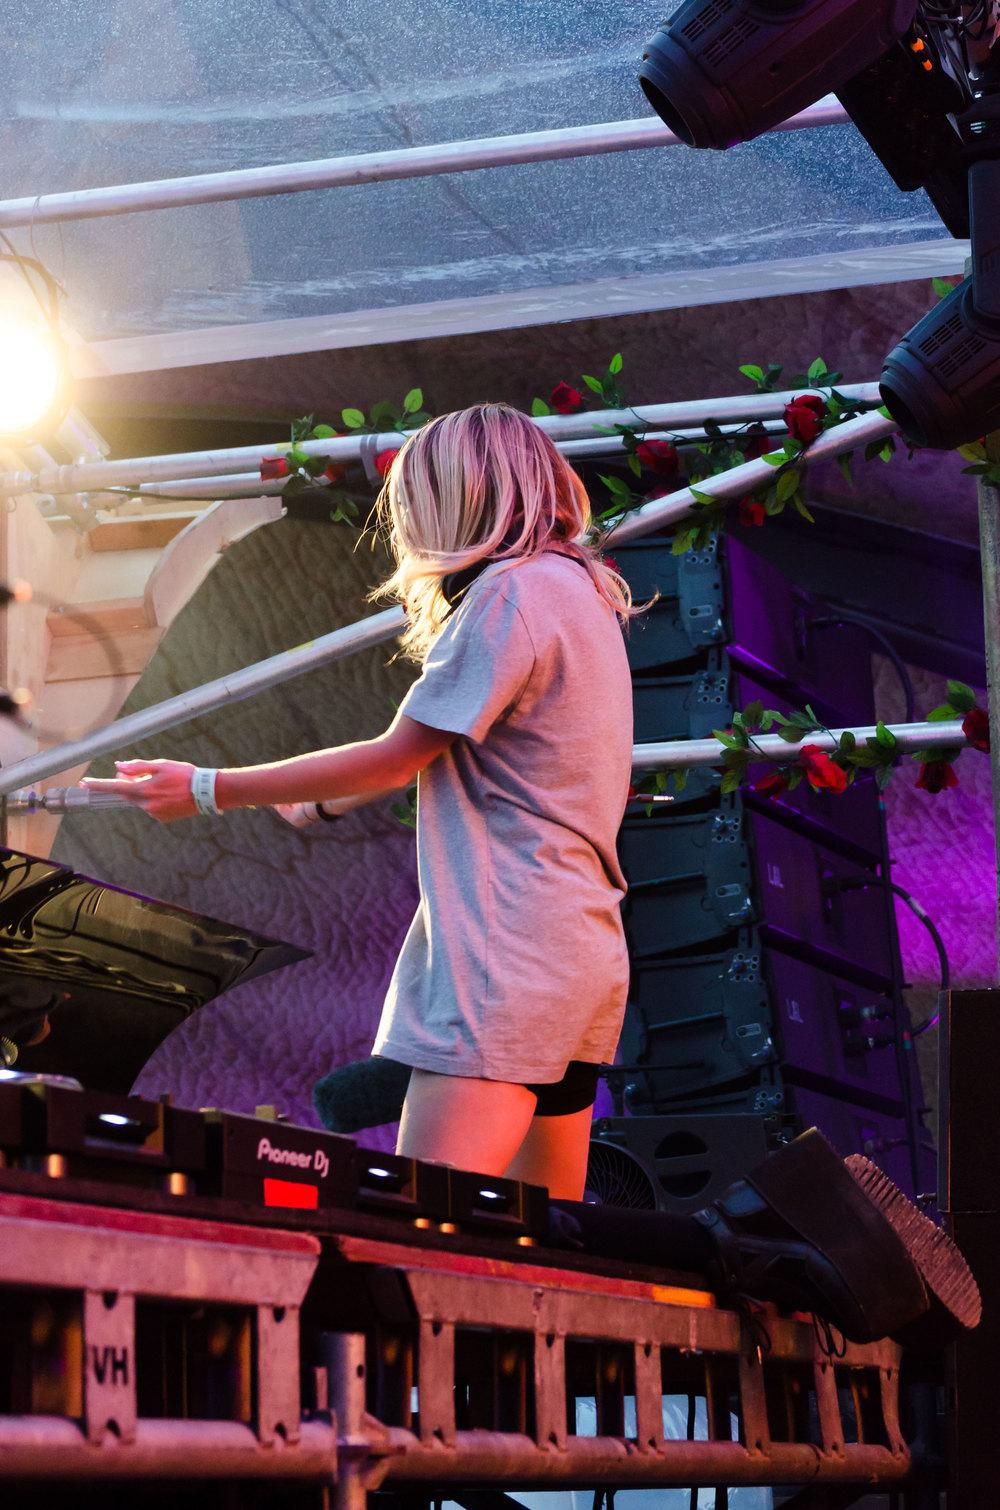 Alison-Wonderland-Tomorrowland-2016-6-casenruiz.jpg